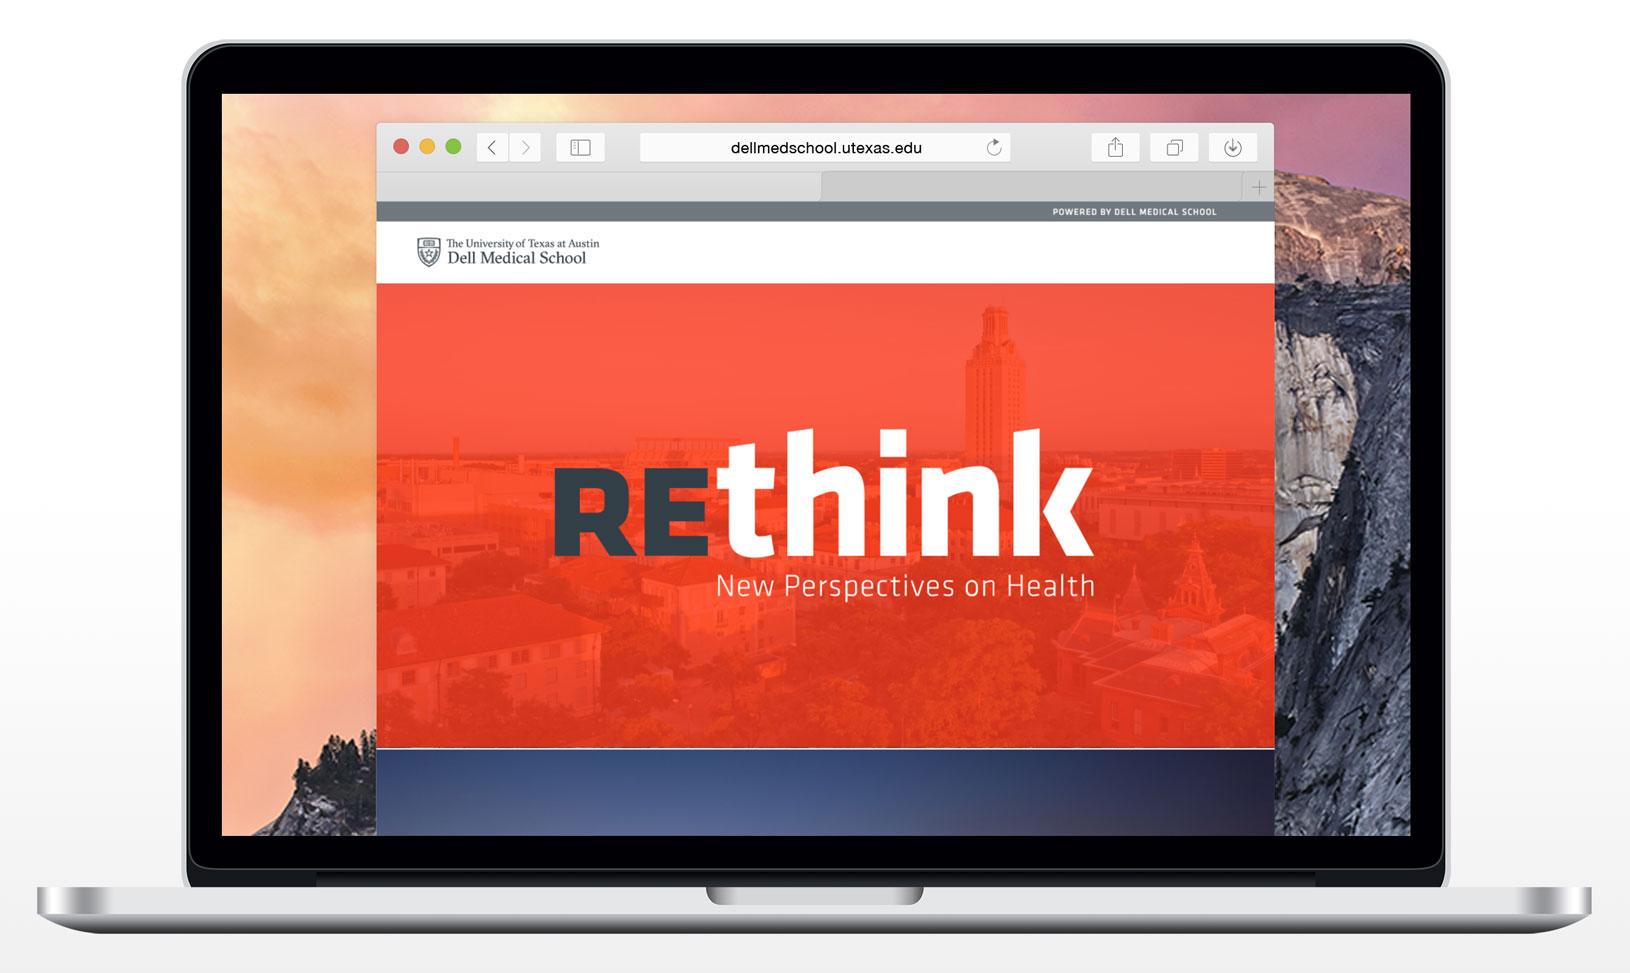 Dell Medical School Rethink Homepage Design